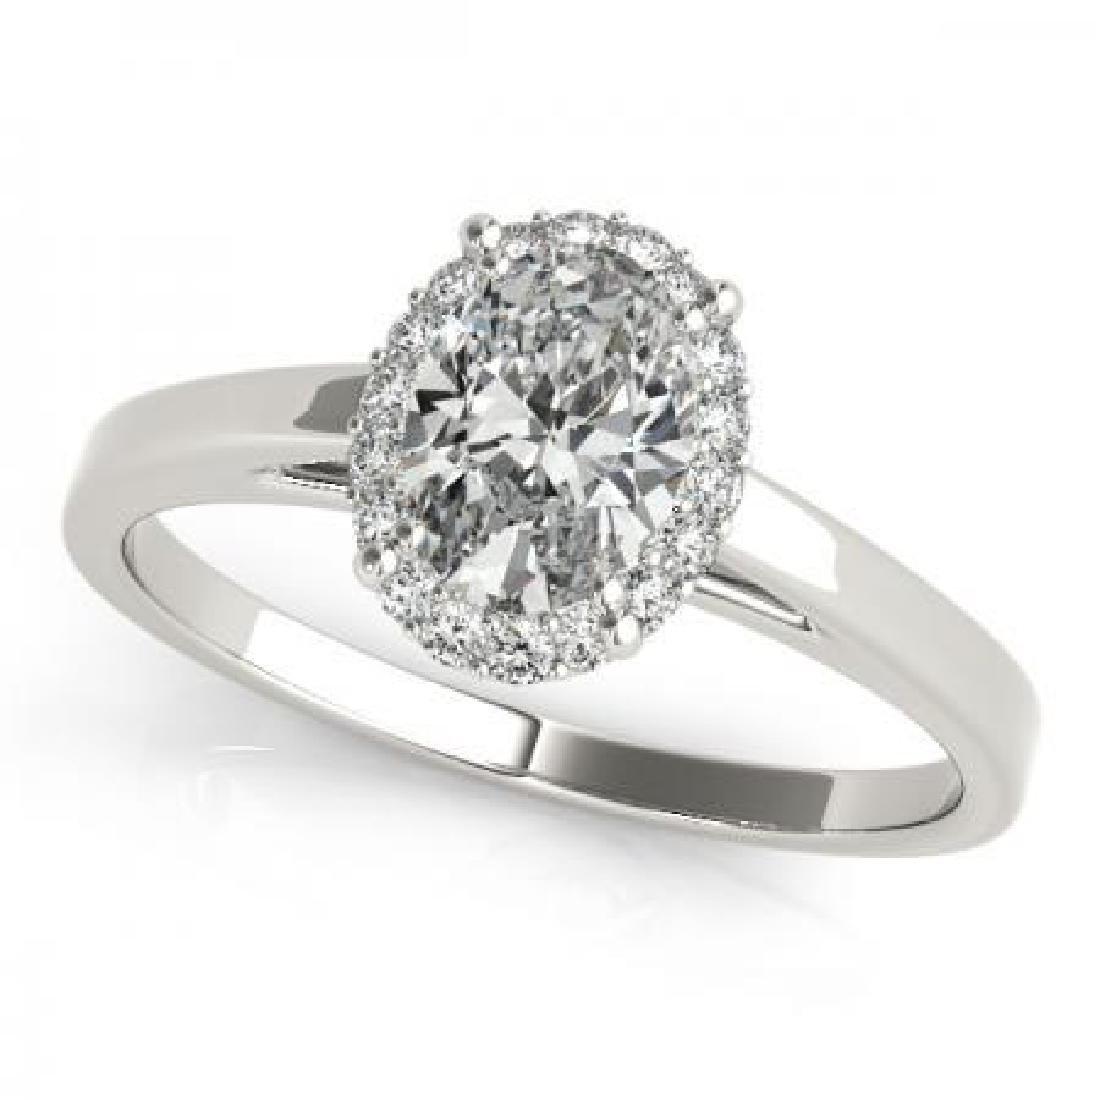 CERTIFIED 18KT WHITE GOLD 1.11 CTW G-H/VS-SI1 DIAMOND H